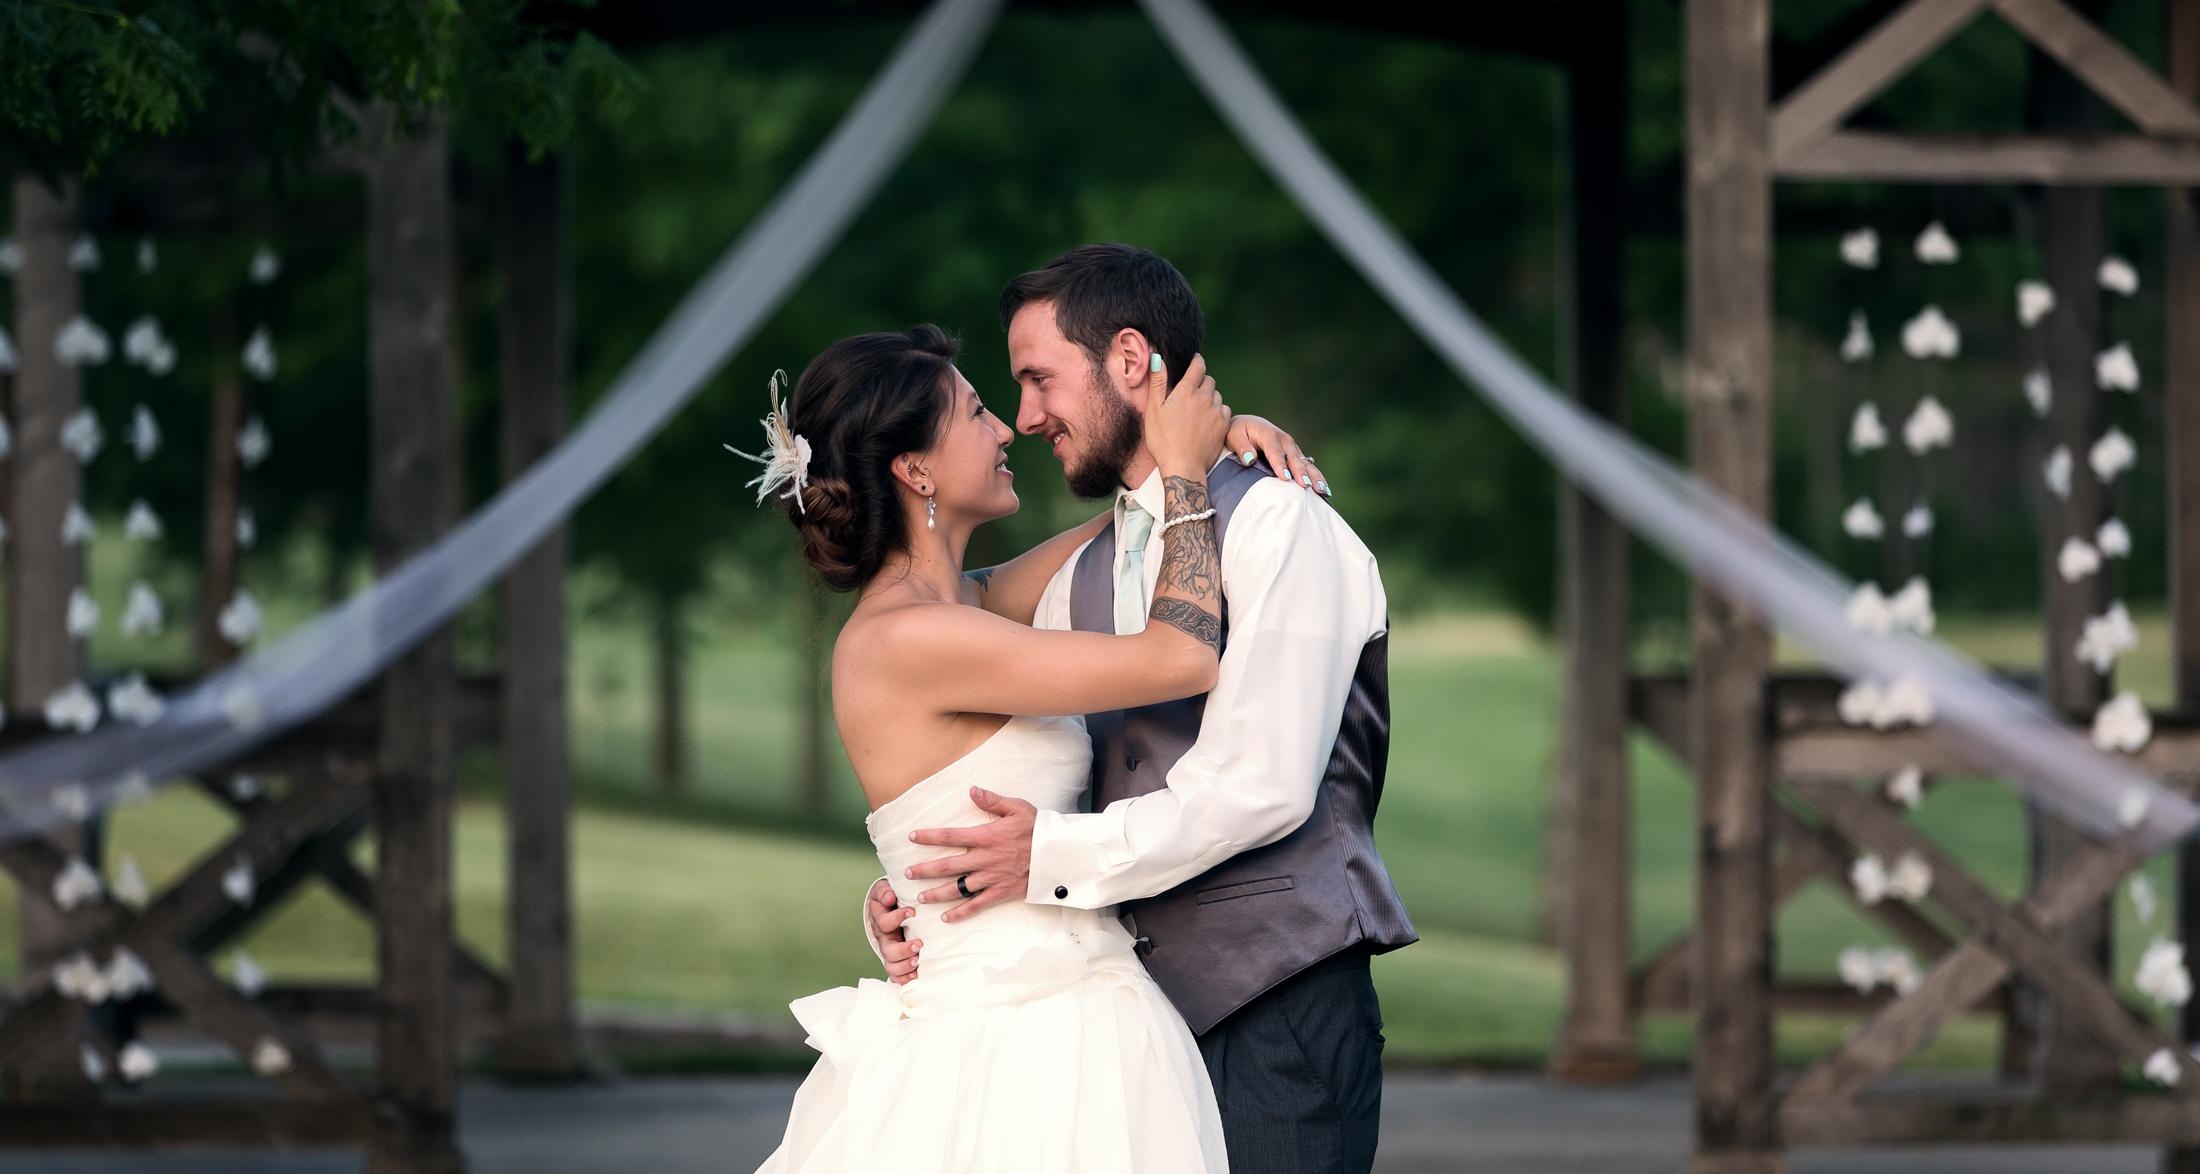 Twinbliss_Photography_Chicago_Weddings_Engagements_Kacikay_Brandyn_Rock_Falls_Illinois